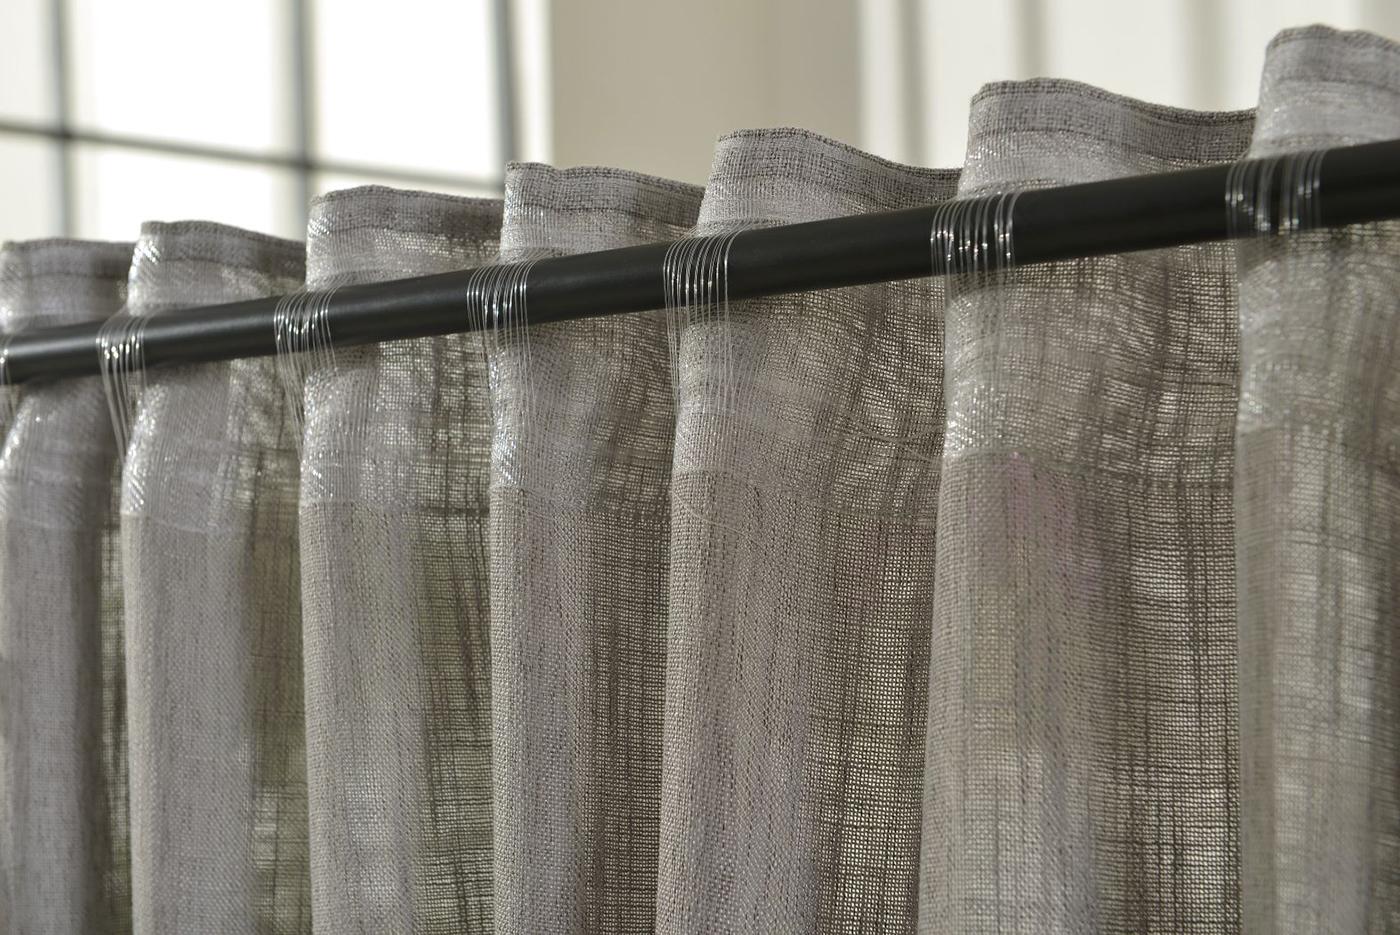 vorhang schlaufen linene blickdicht leinen grob optik 245x140 hxb grau ebay. Black Bedroom Furniture Sets. Home Design Ideas